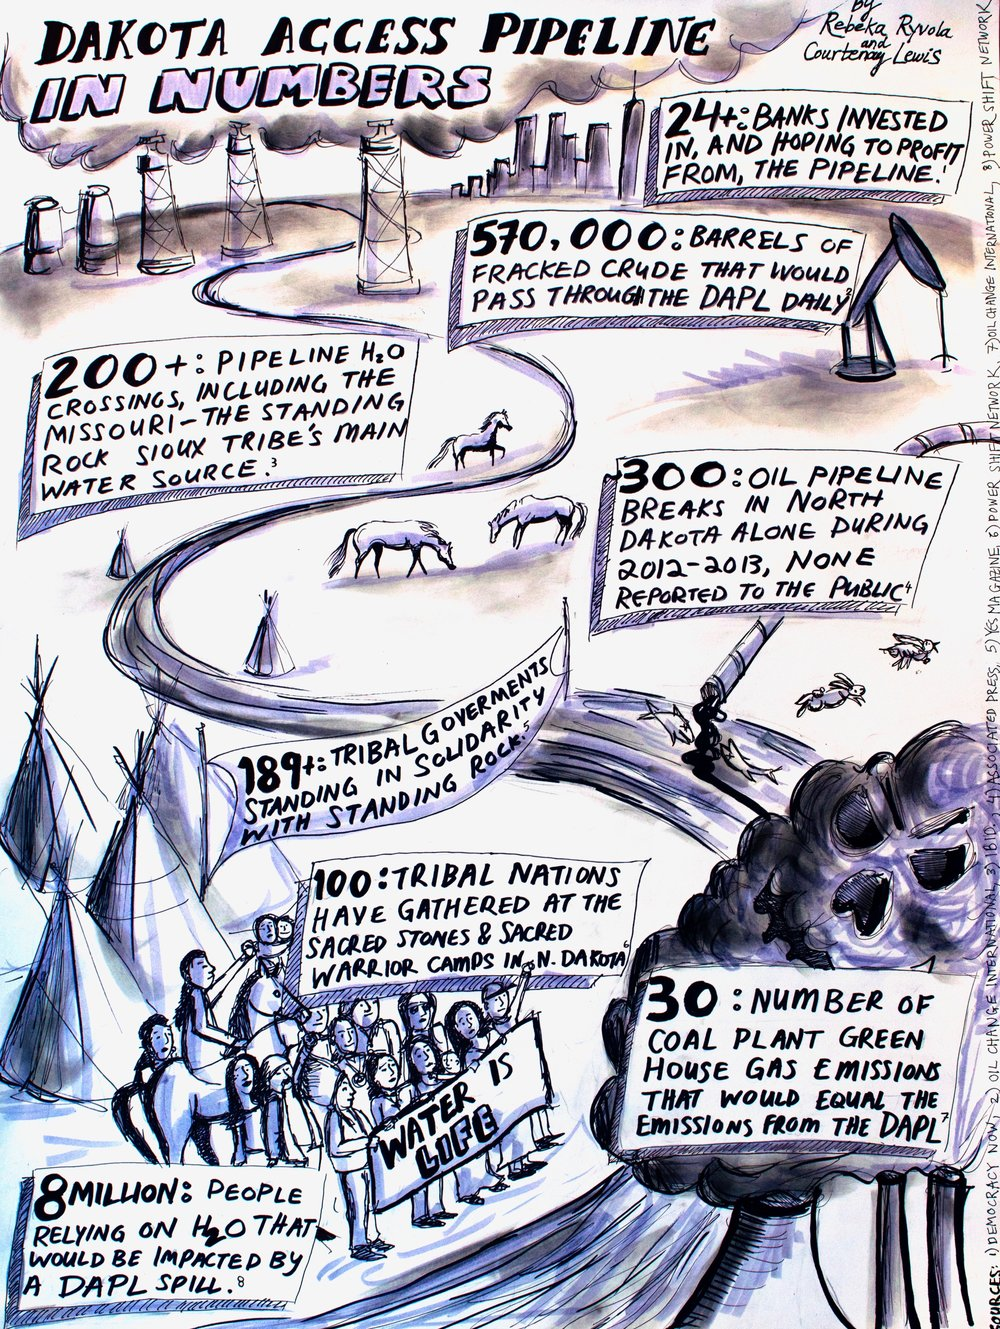 Infographic on Dakota Access Pipeline (w/ Rebeka Ryvola, 2016)